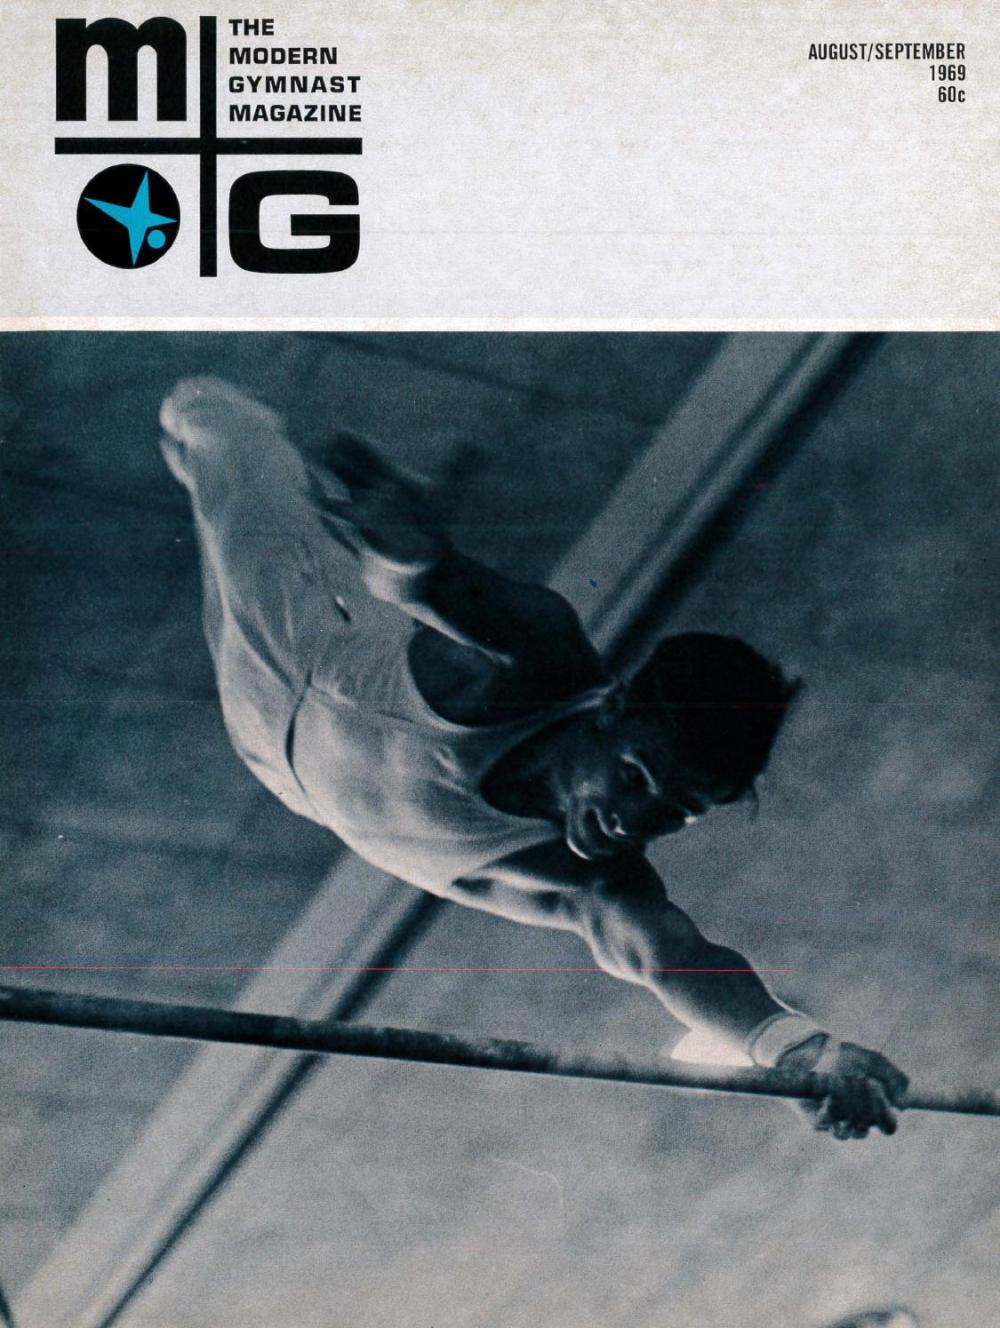 medium resolution of modern gymnast august september 1969